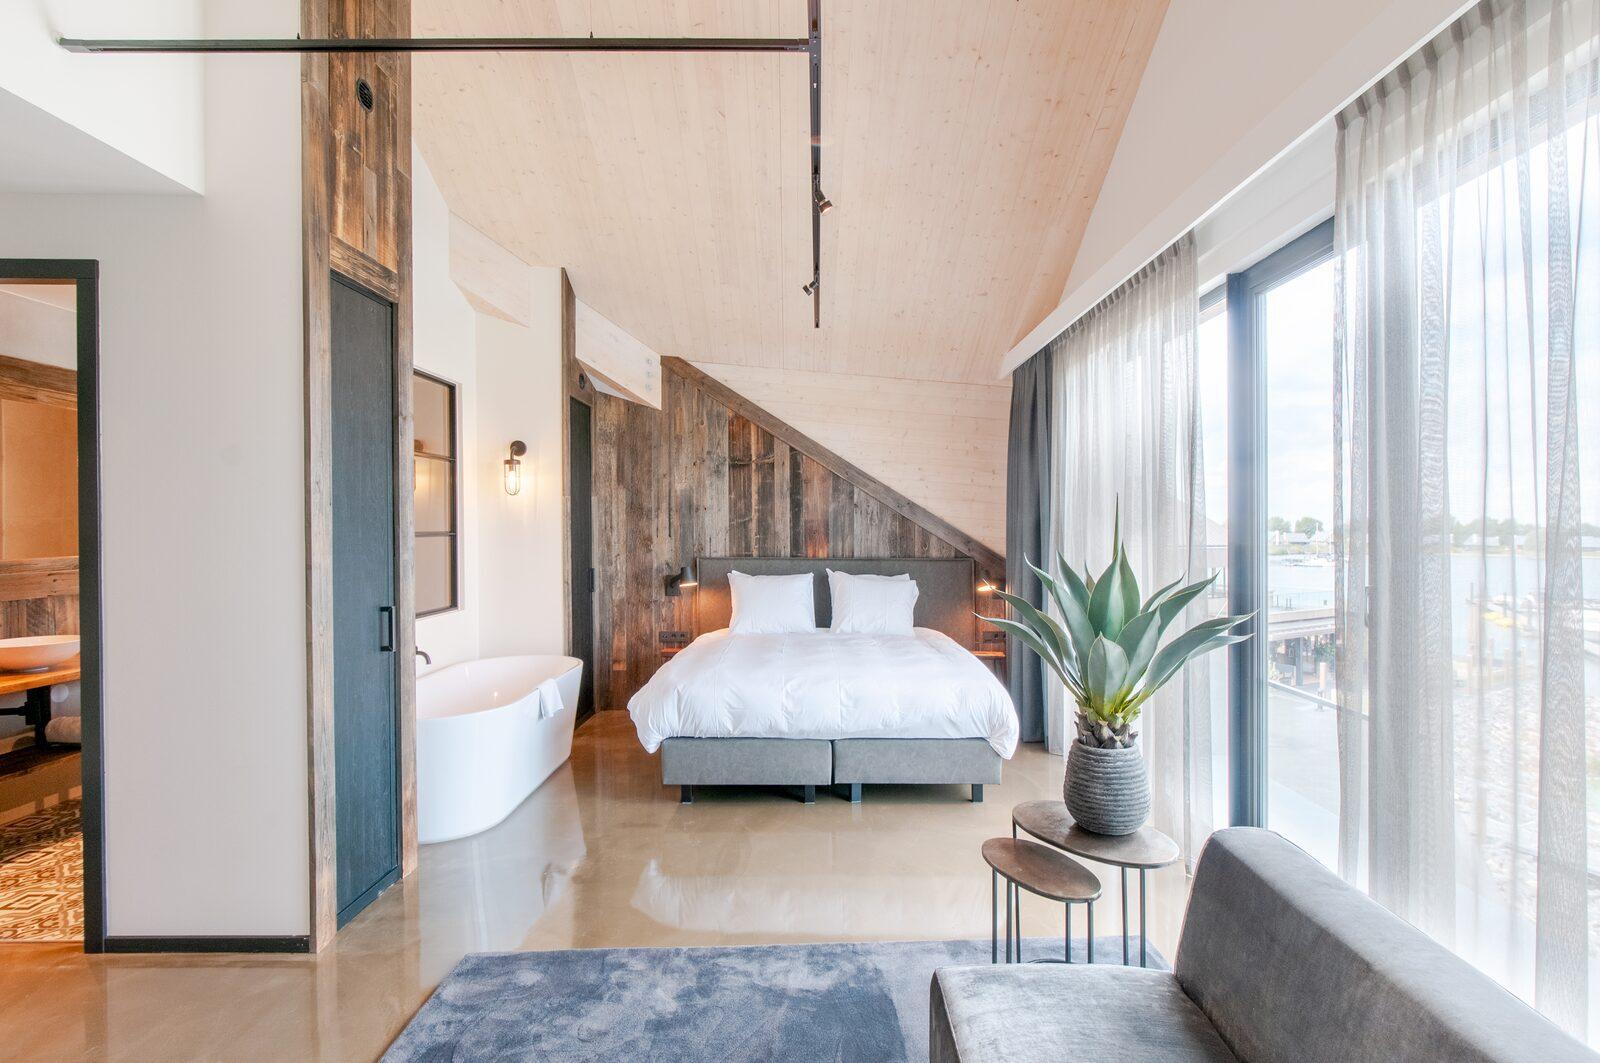 Book a last minute hotel Zeeland